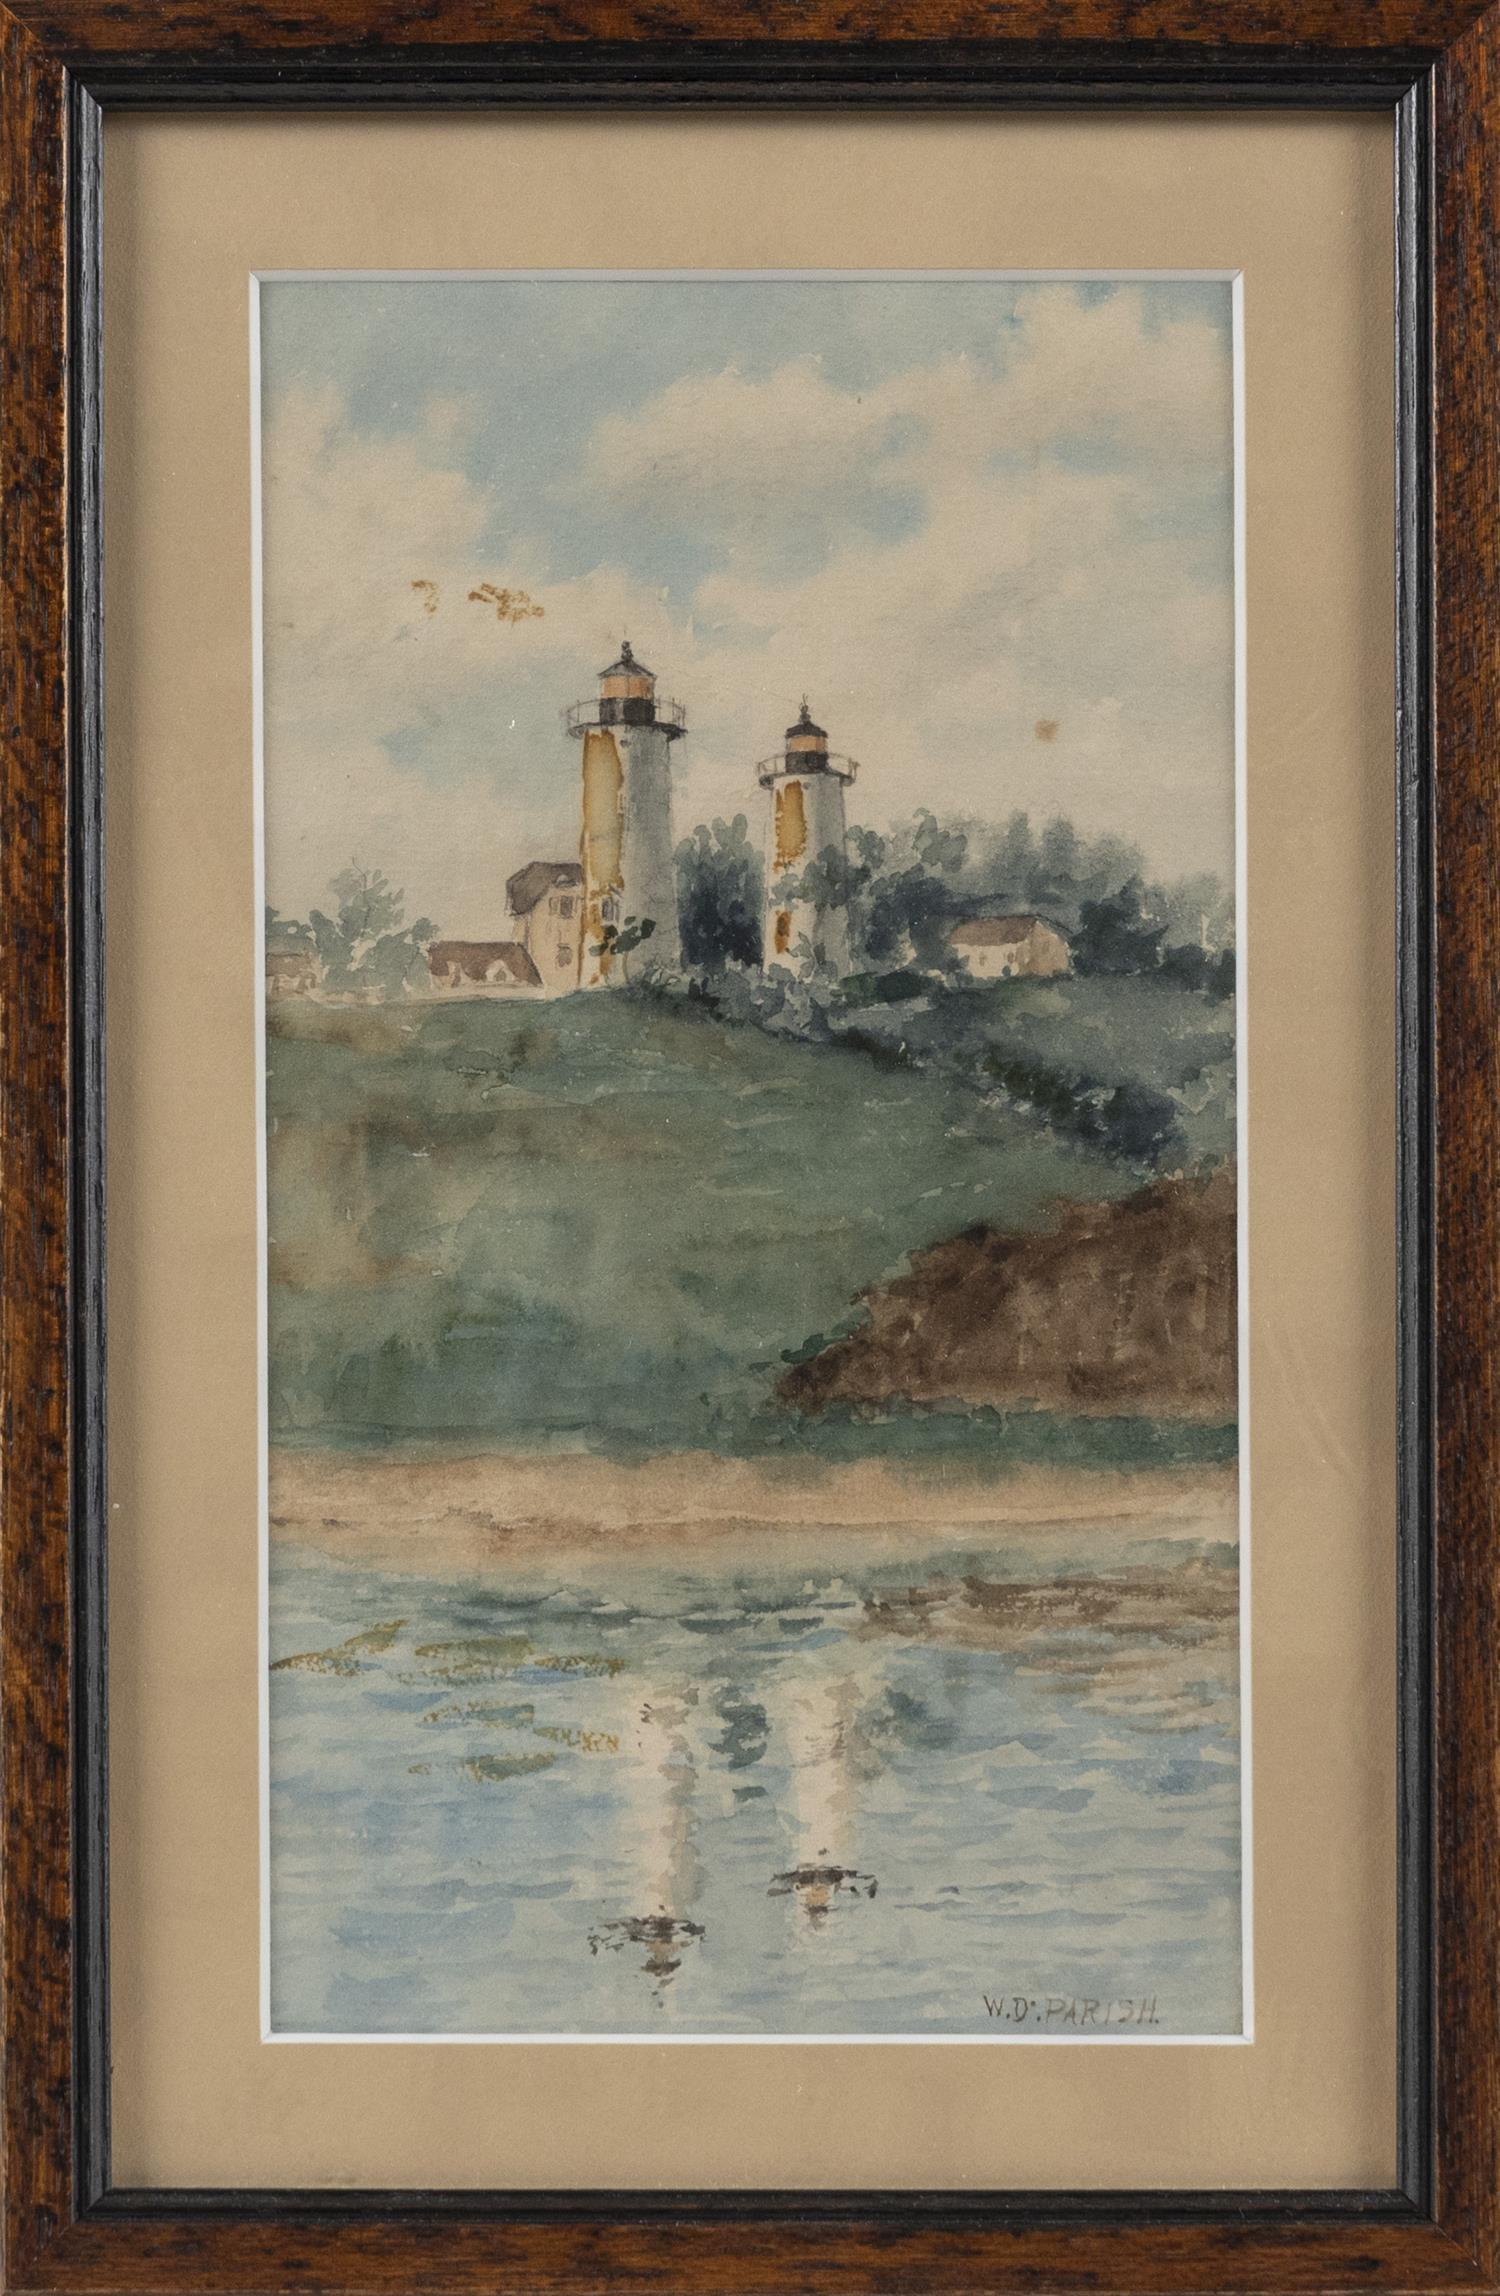 "WILLIAM DANA PARISH, Rhode Island/Massachusetts/California, 1862-1949, Twin Lights, Chatham., Watercolor on paper, 9"" x 5"" sight. Fr..."